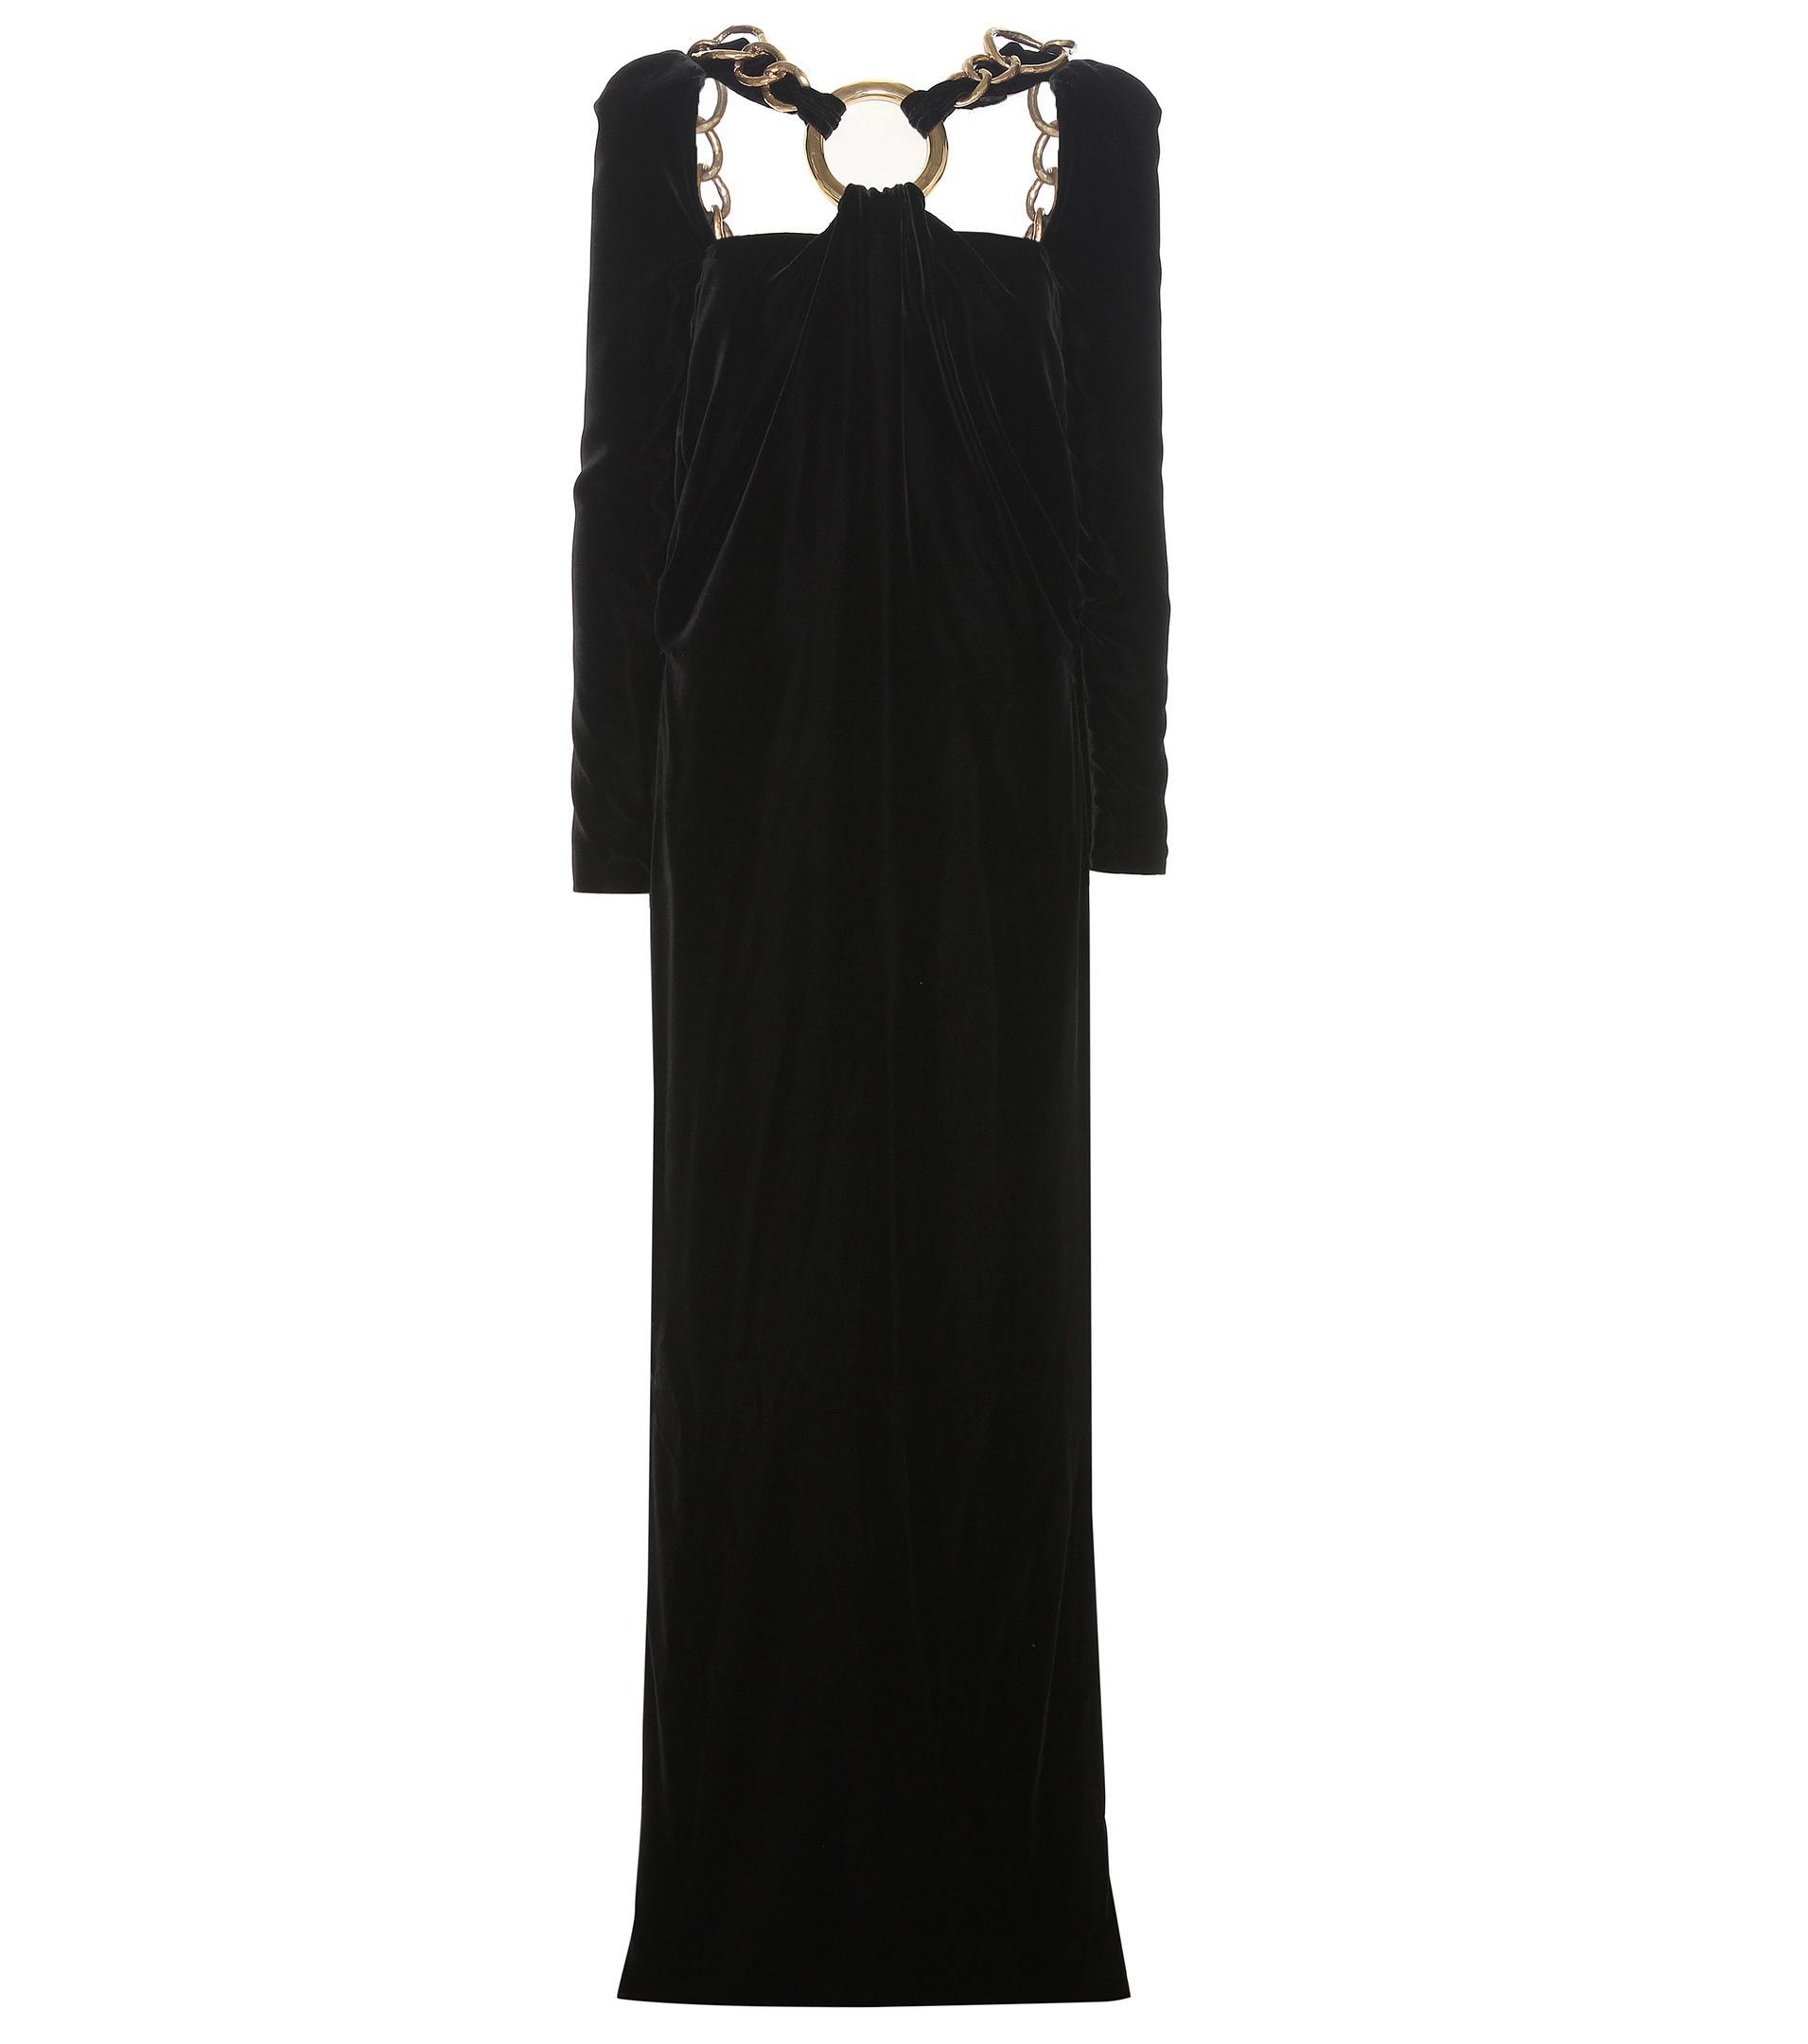 Tom Ford Embellished Velvet Gown in Black - Lyst